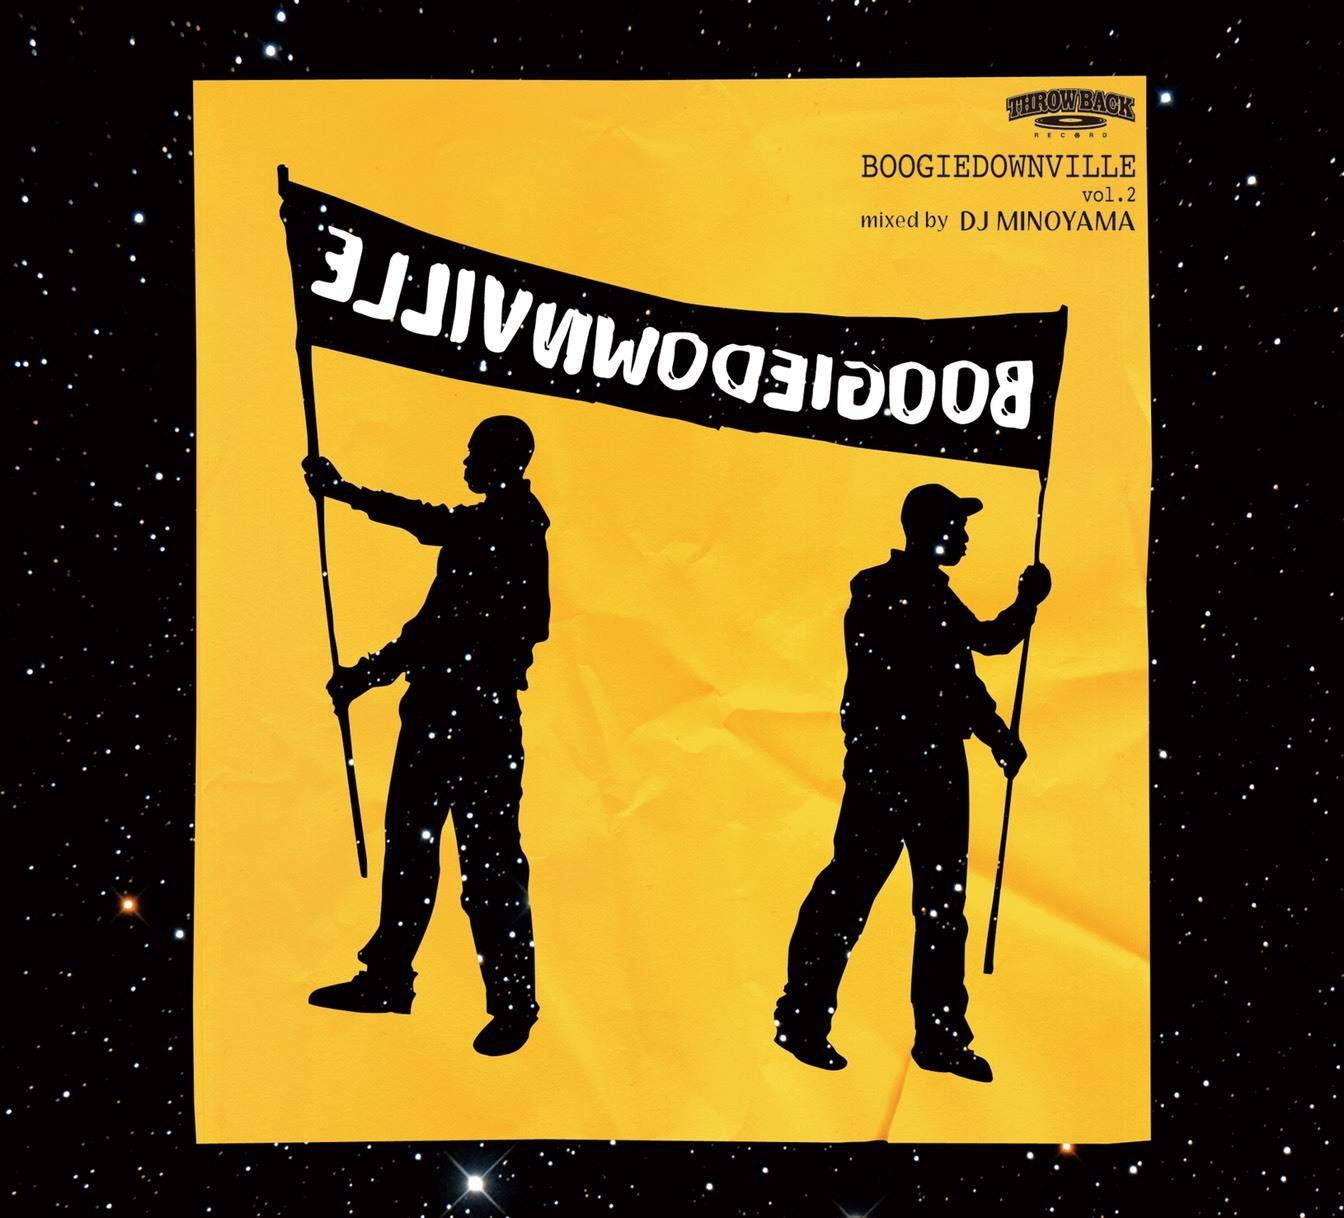 [MIX CD] DJ MINOYAMA / BOOGIEDOWNVILLE vol,2